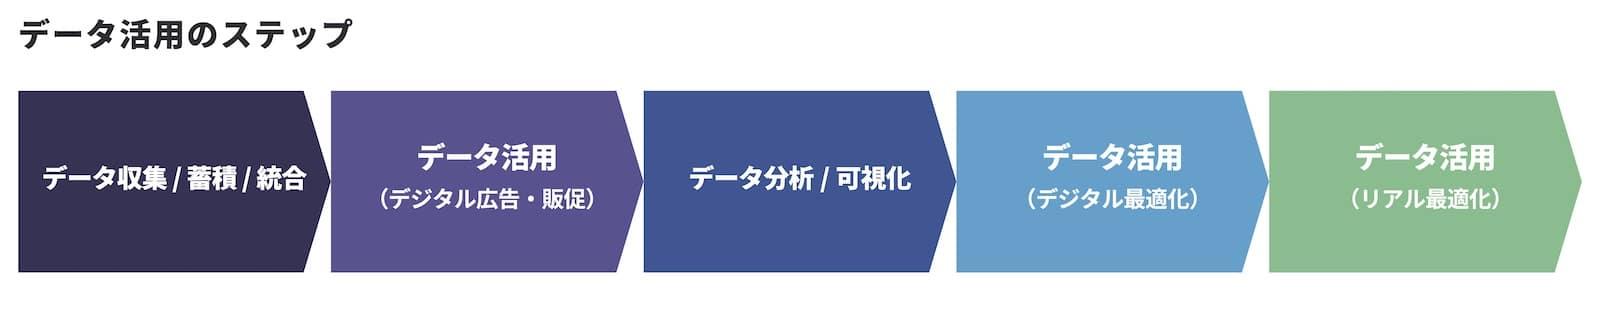 case-study-stripe-dx-mia-1_ データ活用のステップ